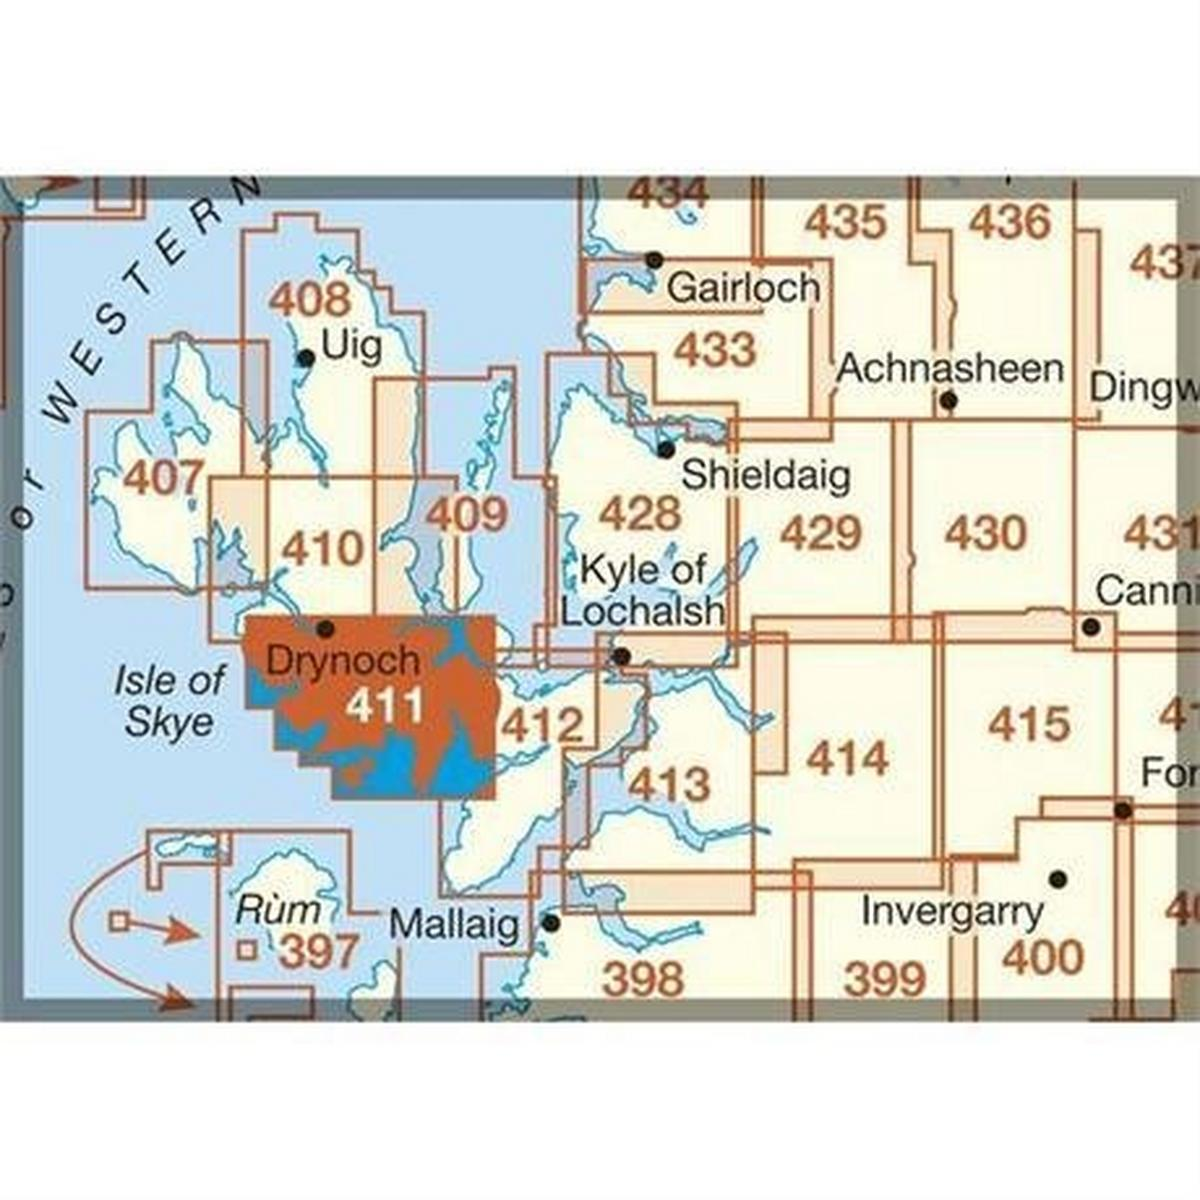 Ordnance Survey OS Explorer ACTIVE Map 411 Skye - Cuillin Hills